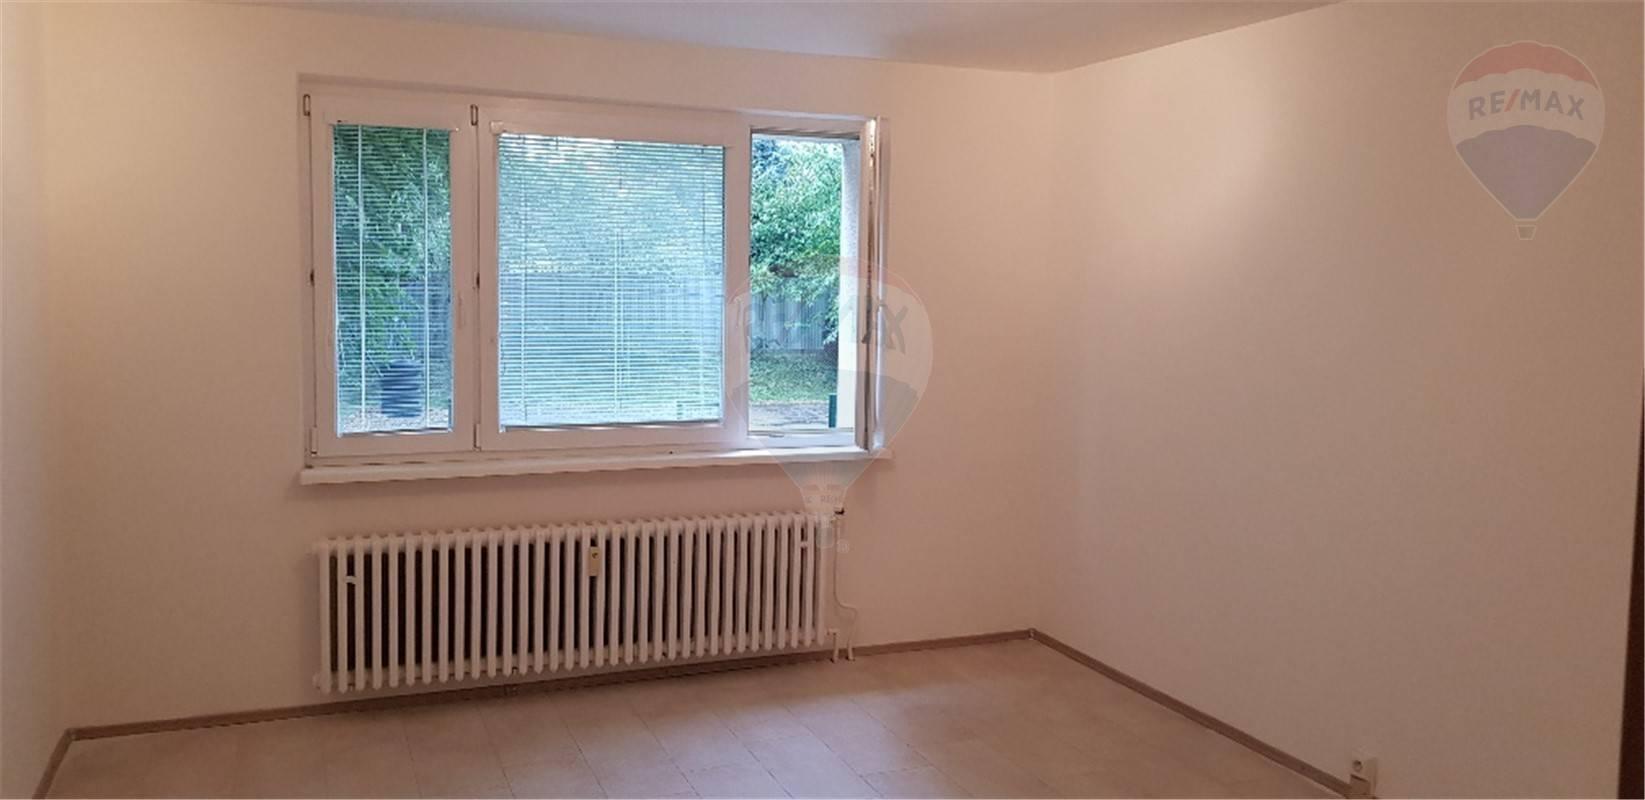 Predaj bytu (1 izbový) 43 m2, Bratislava - Lamač -